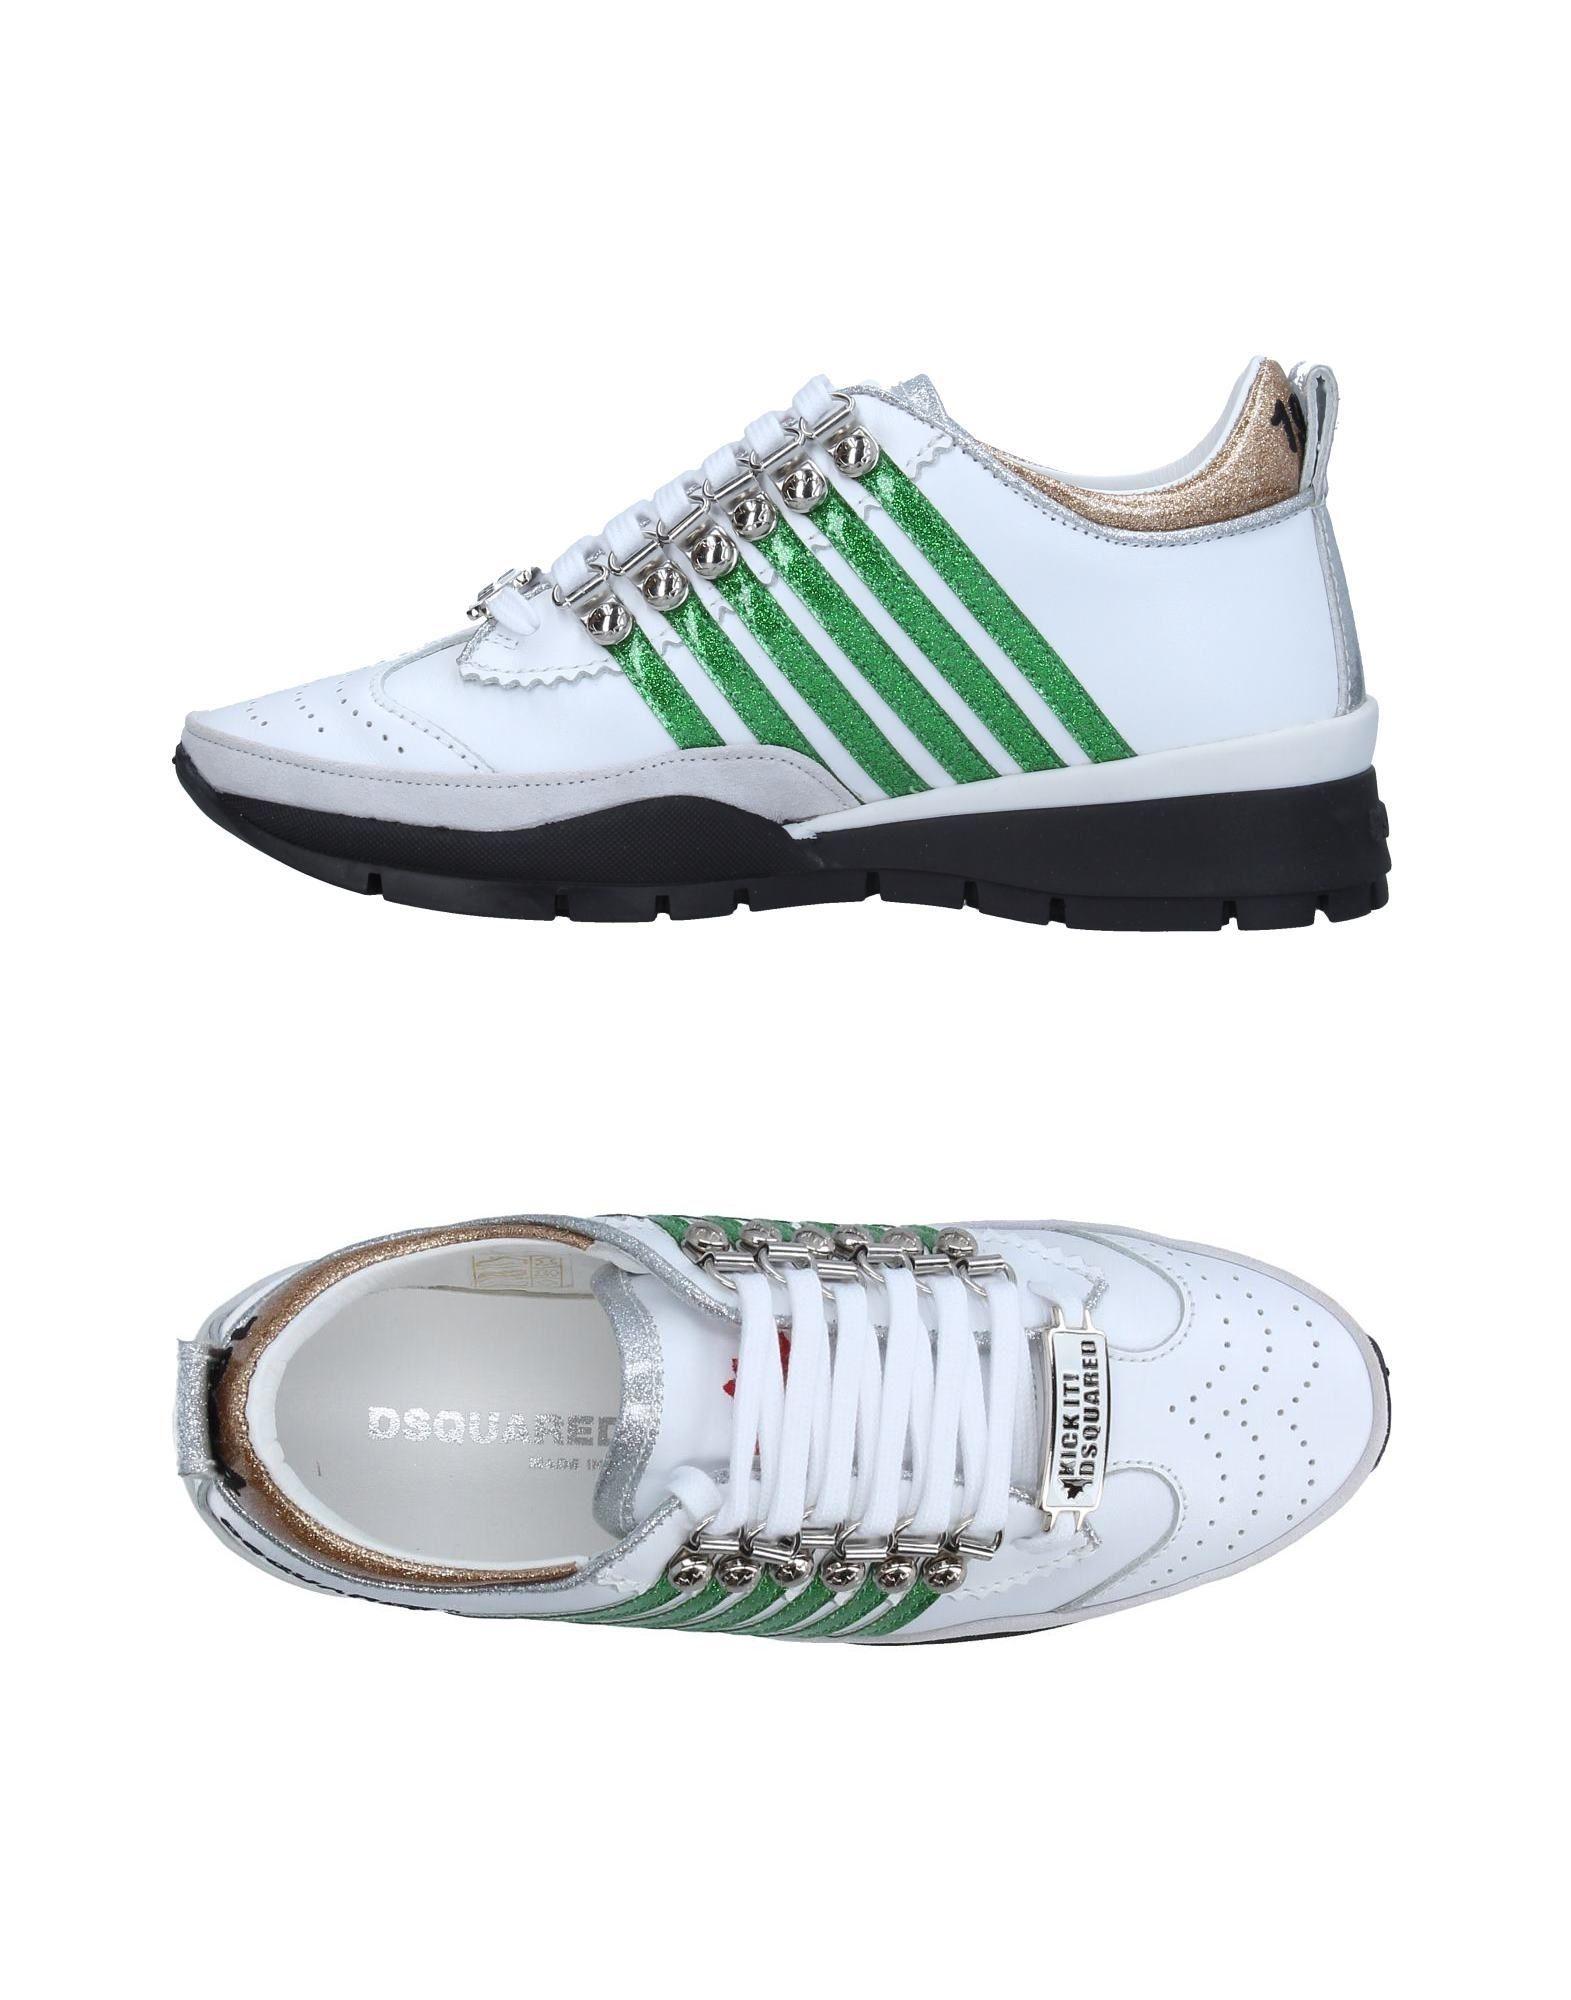 Dsquared2 Sneakers Damen  11298862RCGut aussehende strapazierfähige Schuhe